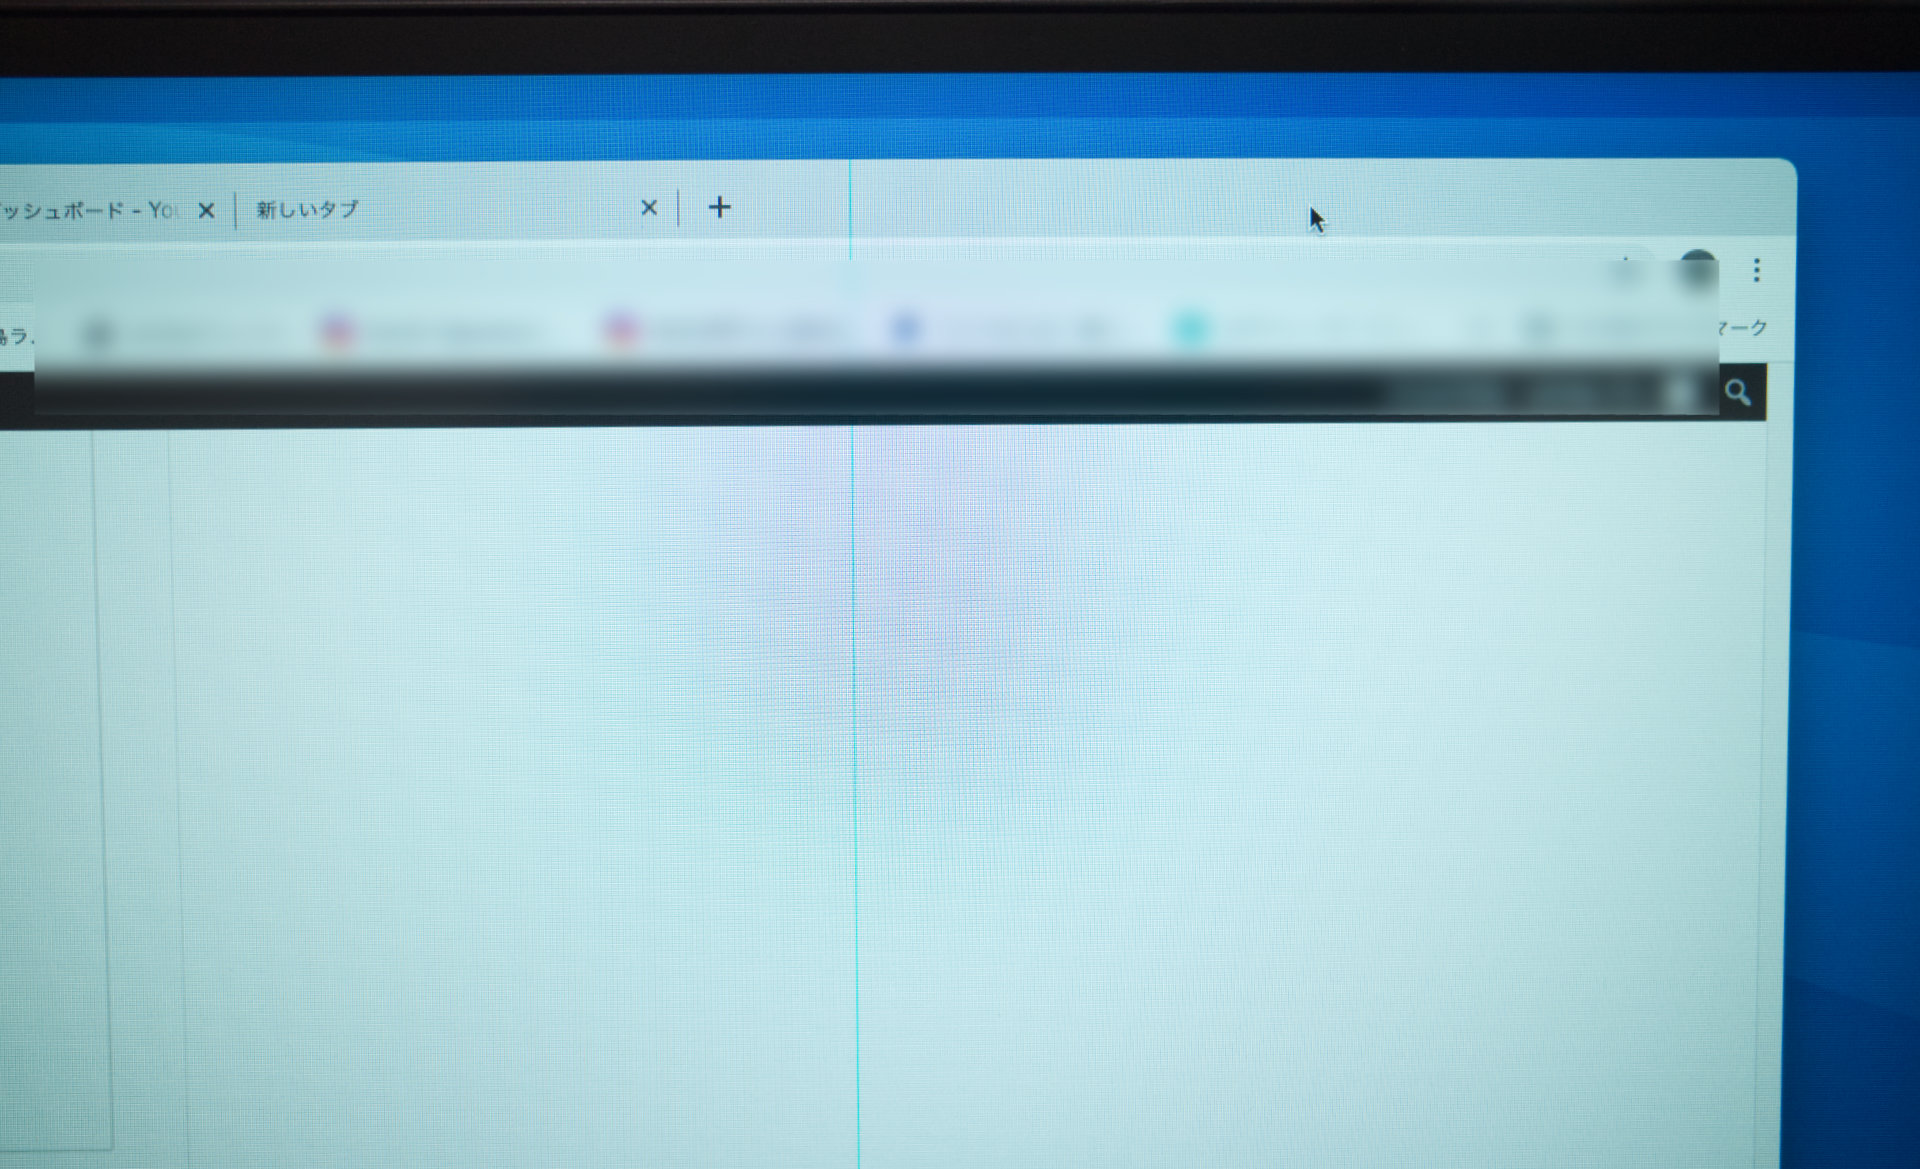 PC液晶モニターに青色(赤色)の一本縦線が入る